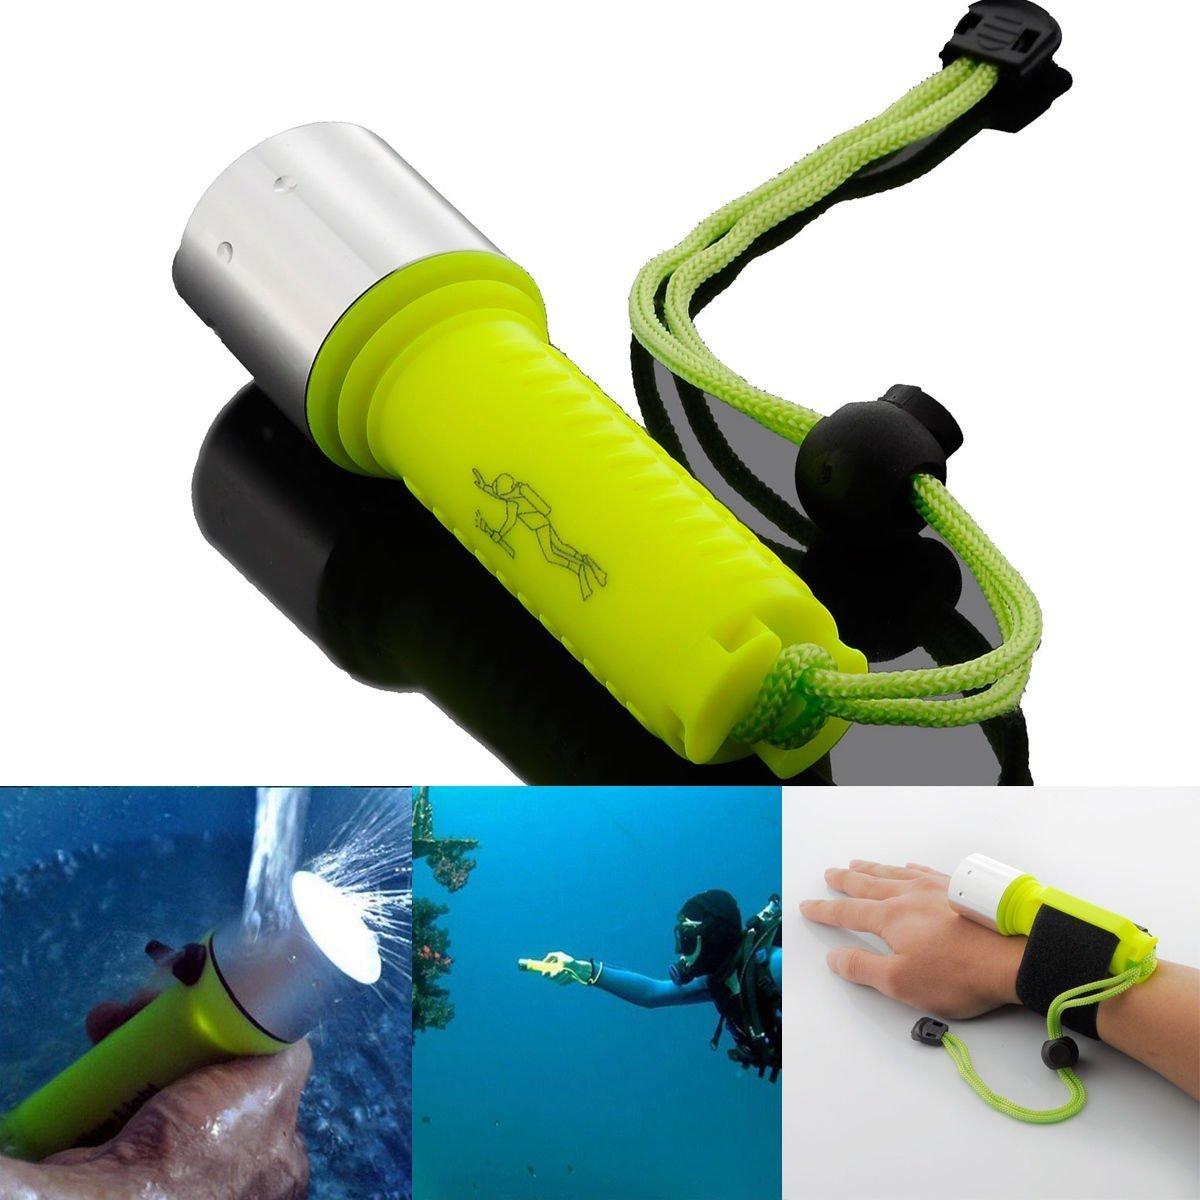 Flashlight torch cree CREE XM-L T6 Underwater 2000LM LED Scuba Diving Flashlight Torch Lamp 60Ms tactical flashlight